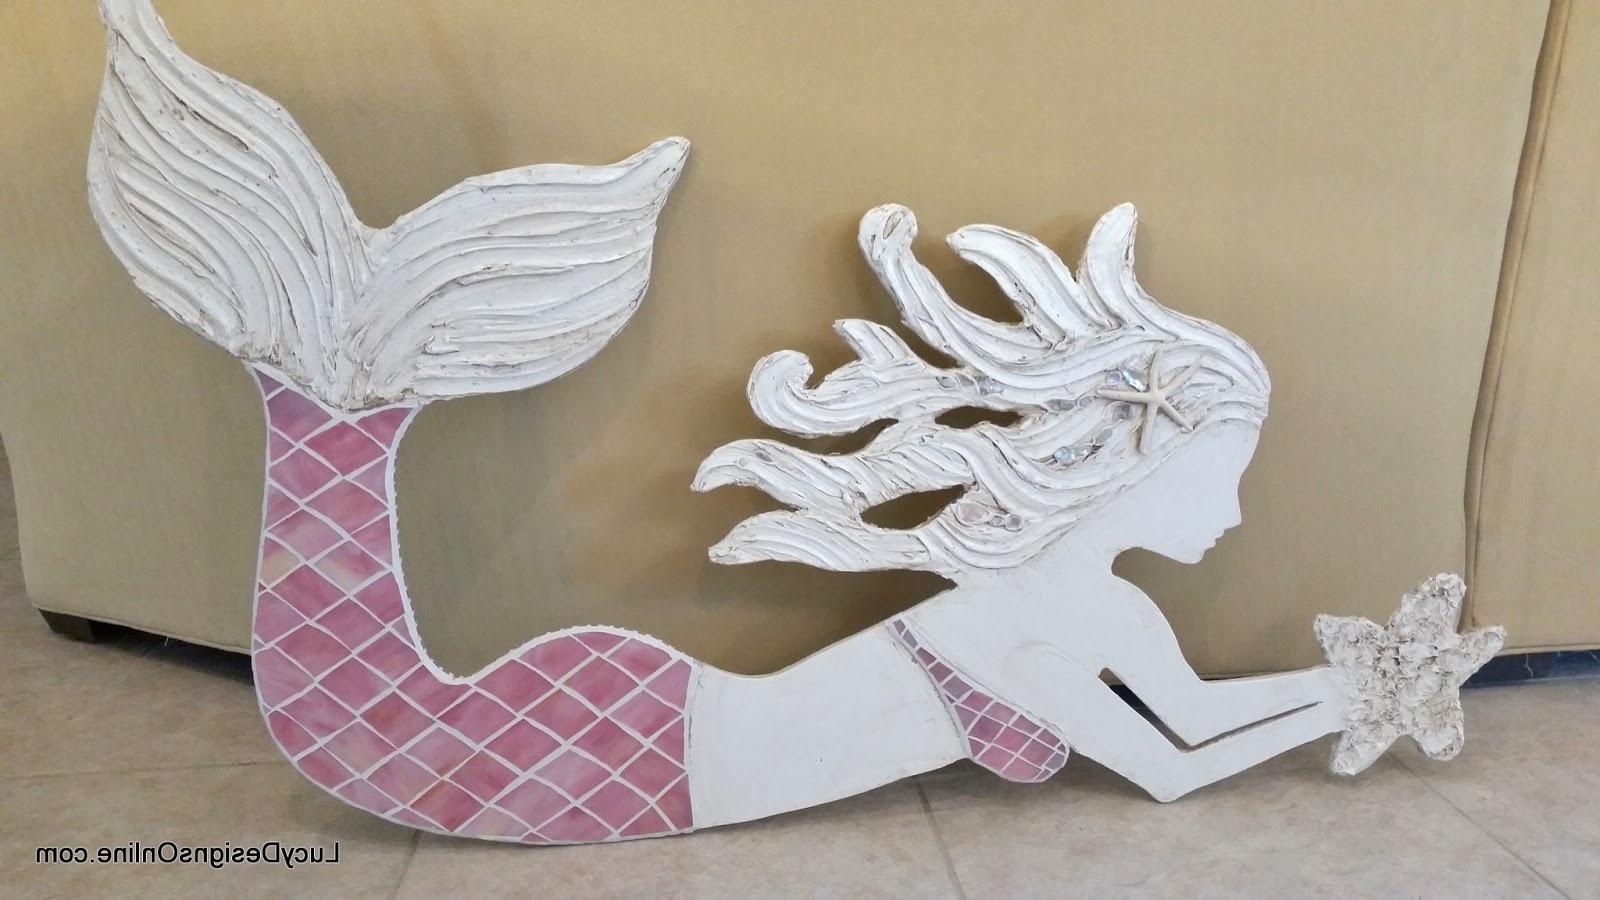 Mermaid Wood Wall Art Intended For Trendy Wooden Mermaid Wall Art (View 3 of 15)